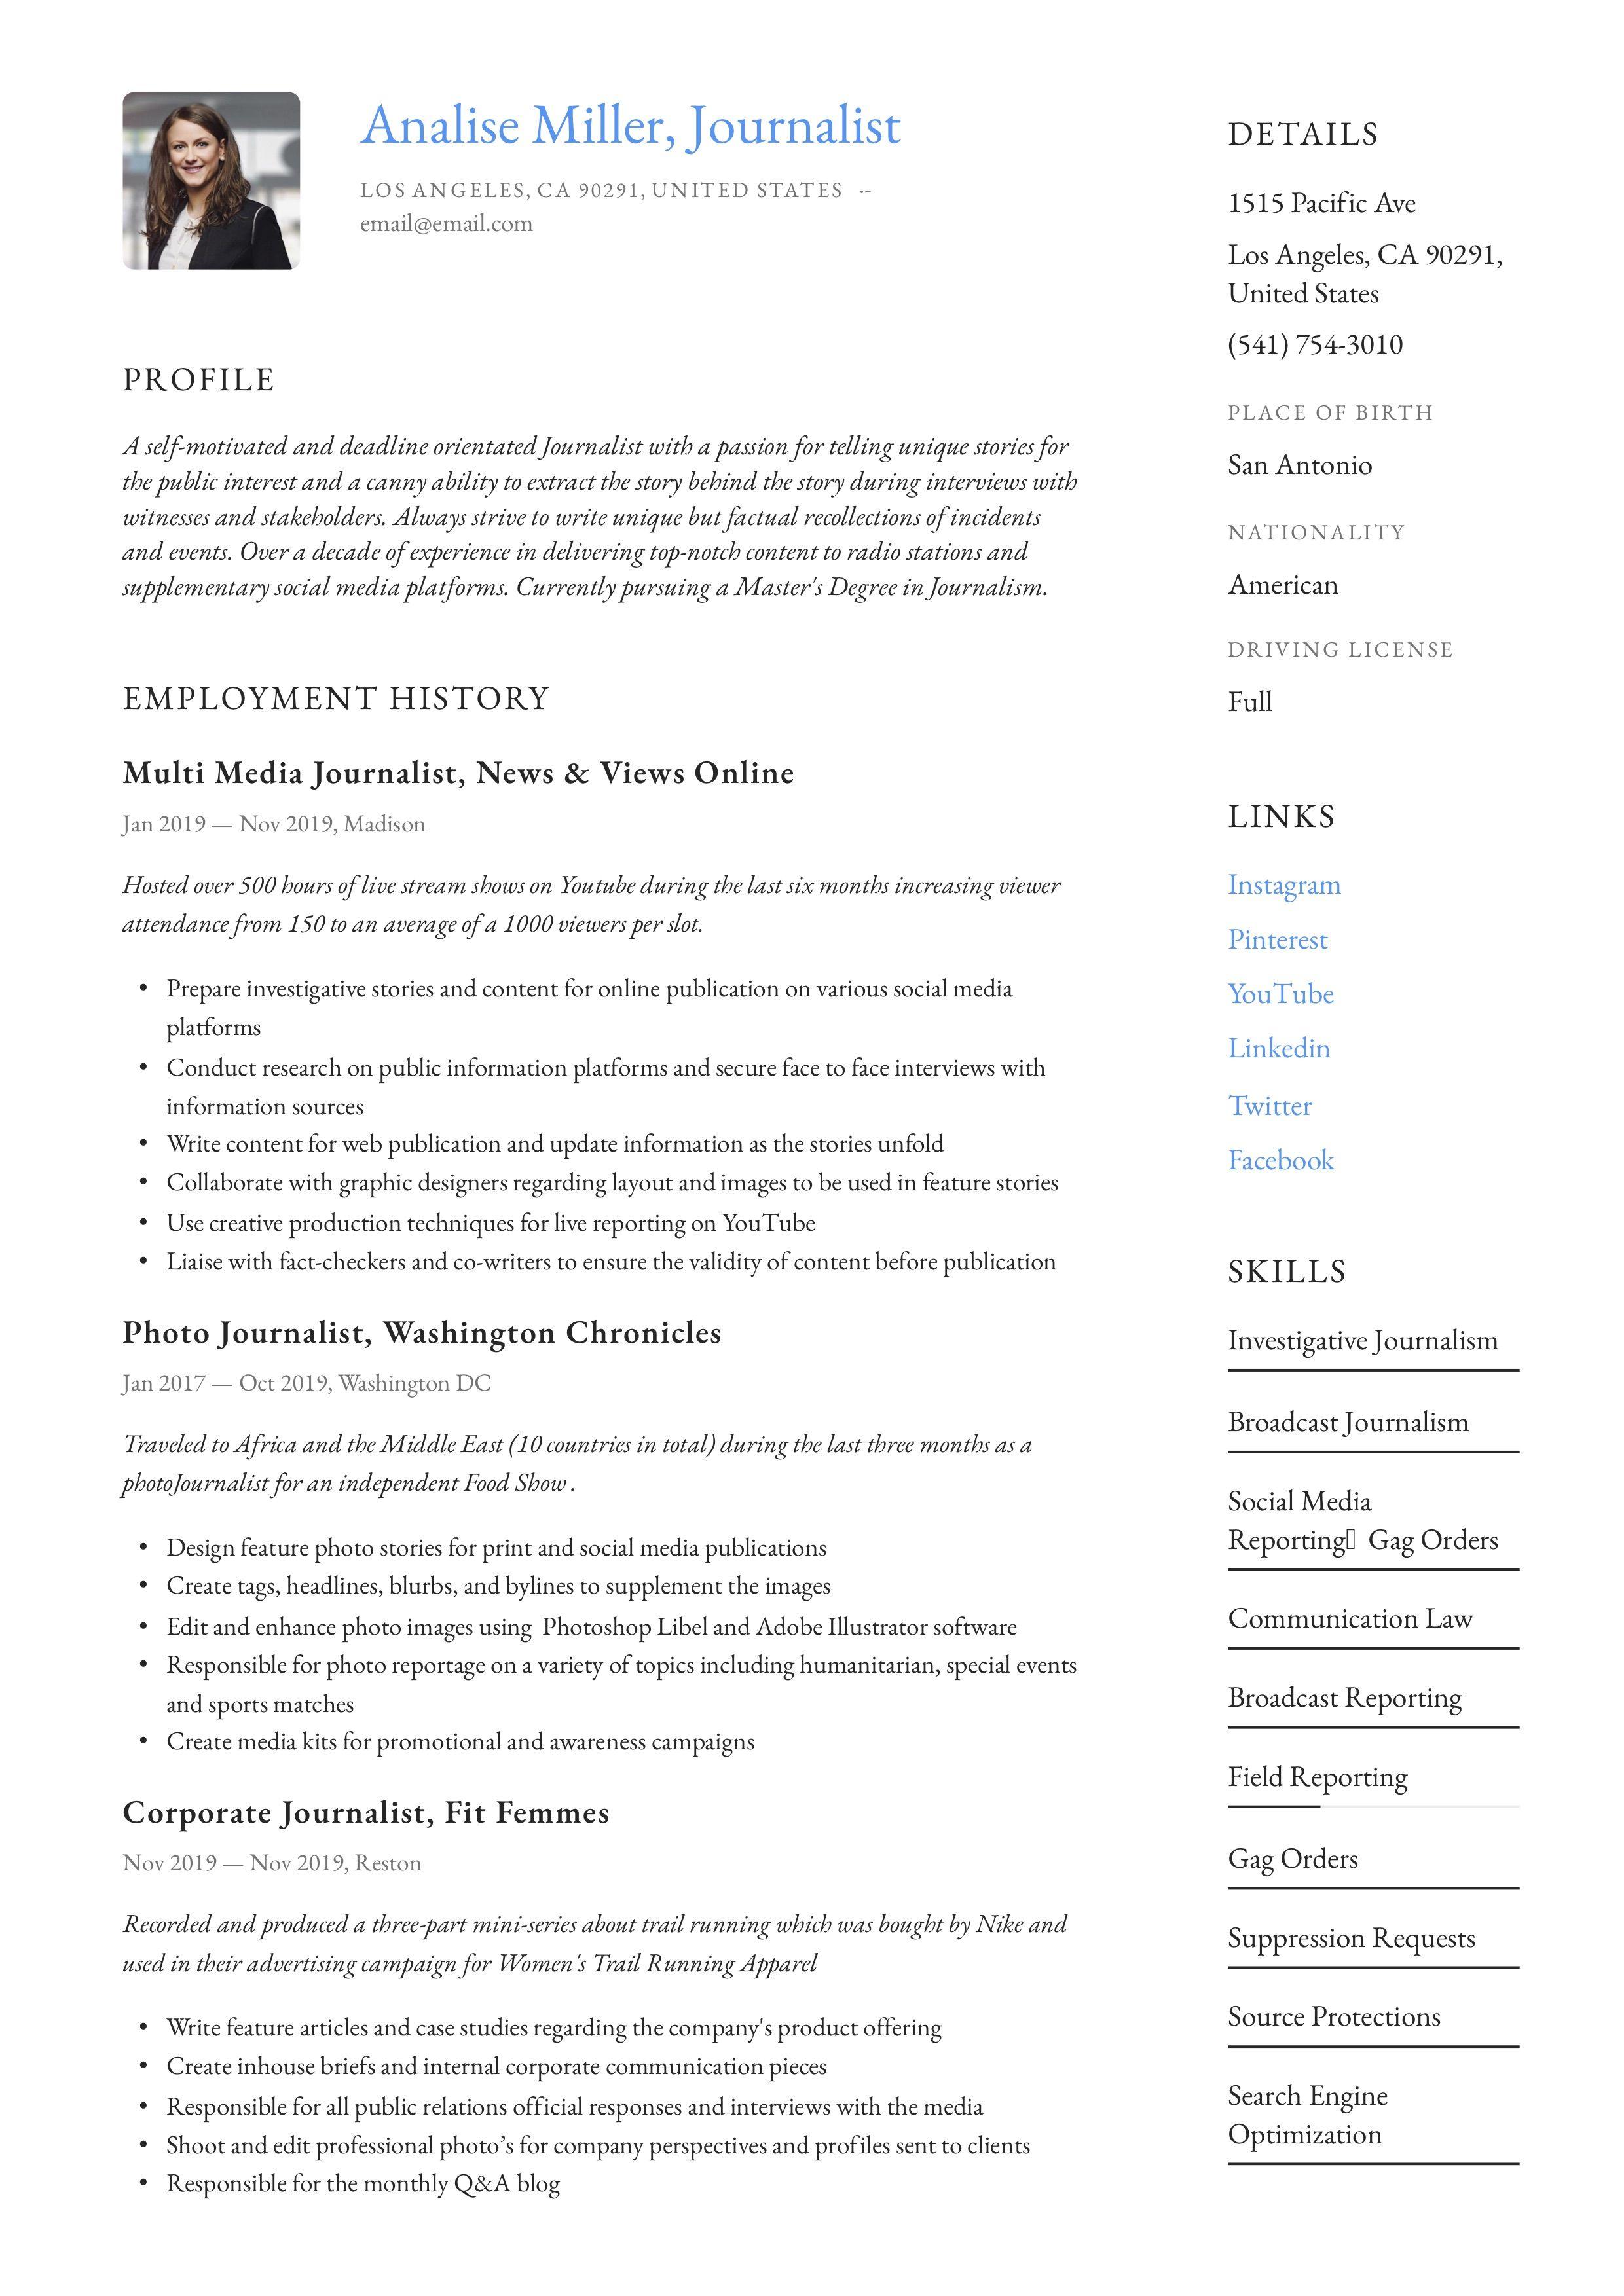 Journalist resume writing guide in 2020 sales resume